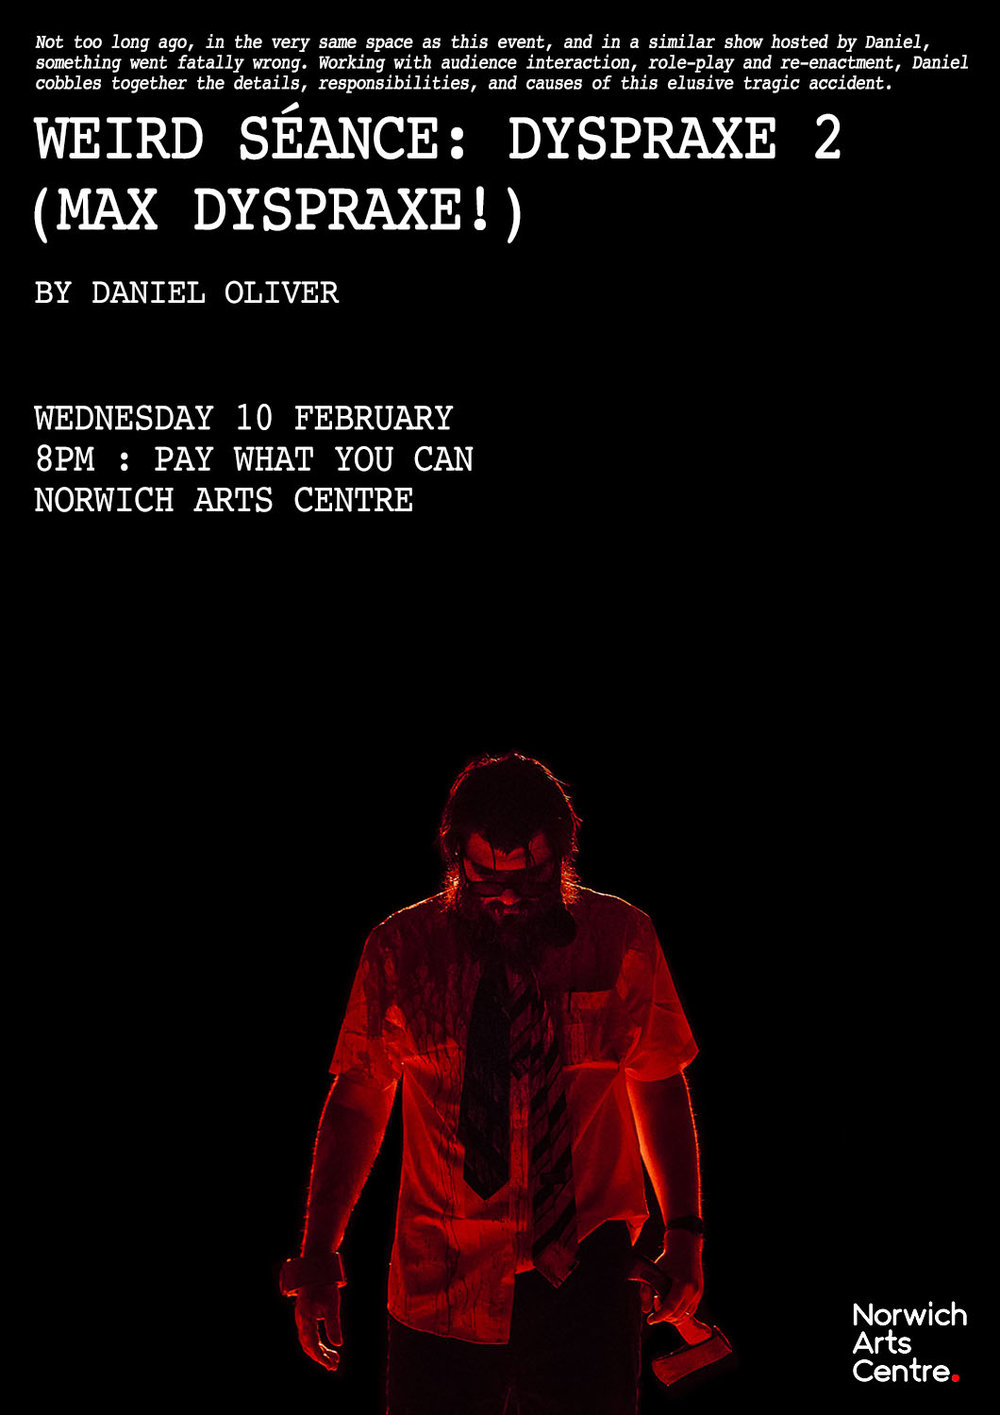 Daniel Oliver | Weird Séance: Dyspraxe 2 (Max Dyspraxe!)    Poster   Norwich, 2016